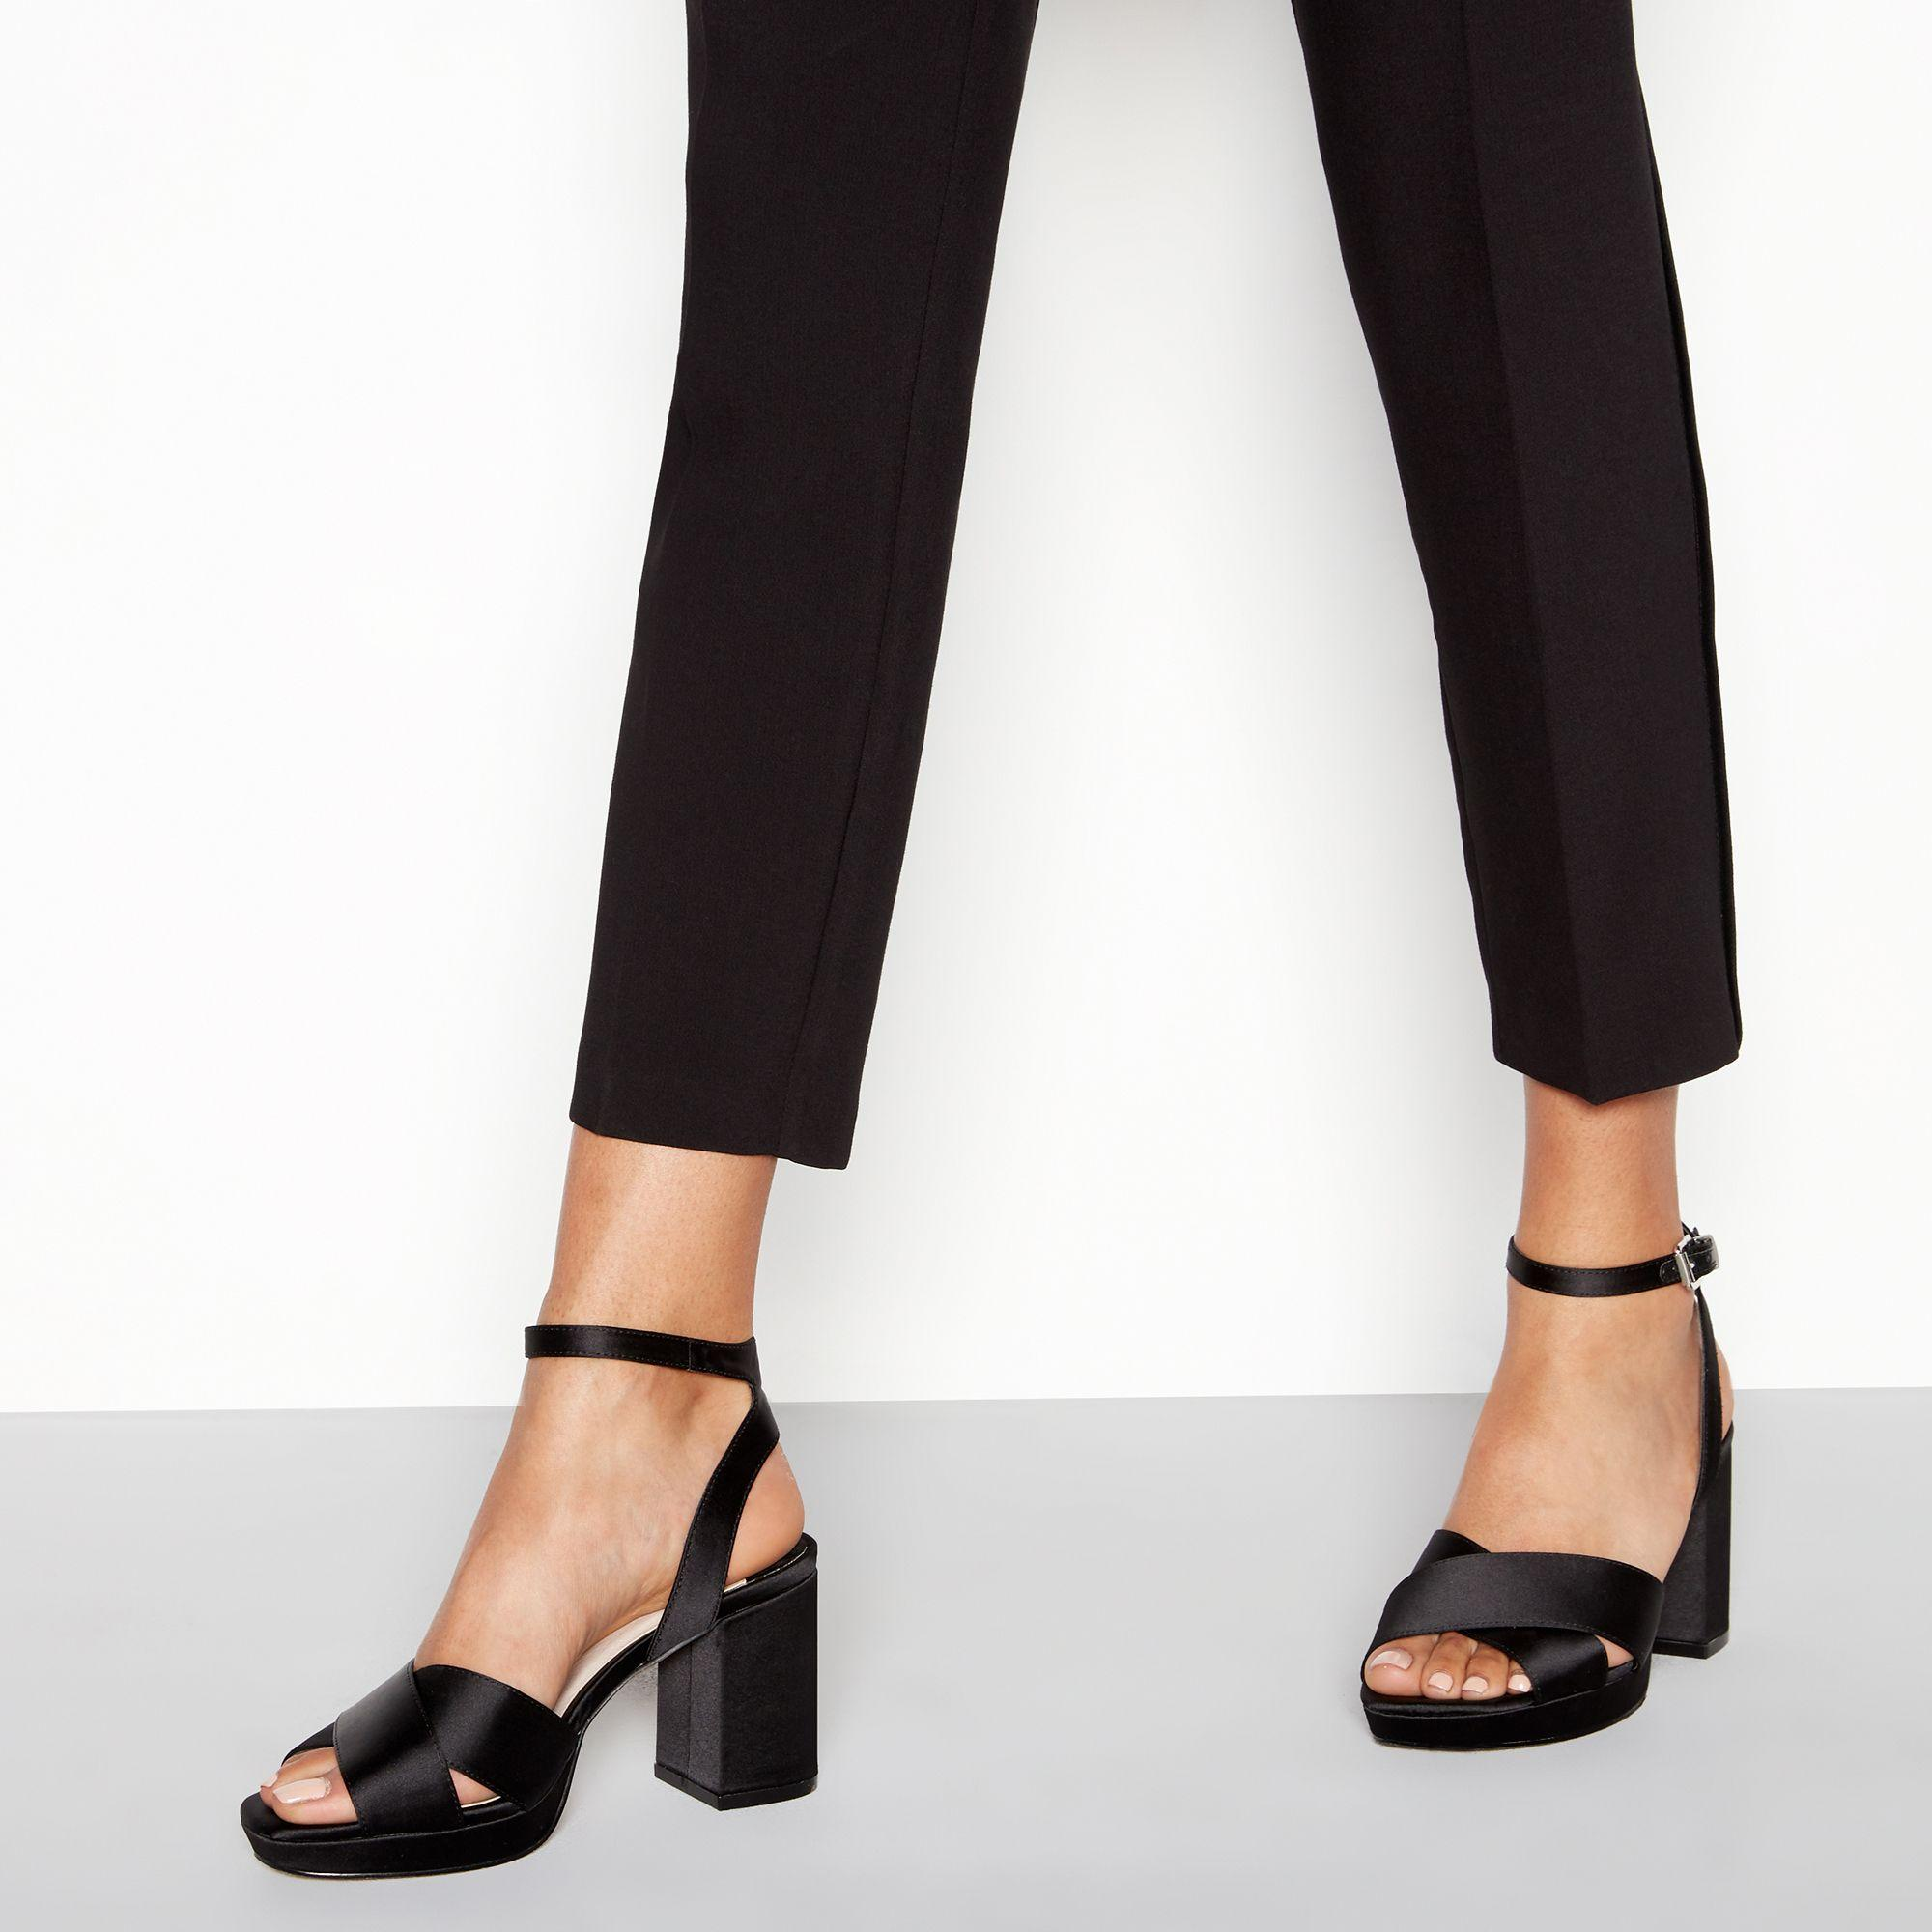 631b4ae99b Faith Black Satin 'worothy' High Platform Heel Wide Fit Sandals in ...